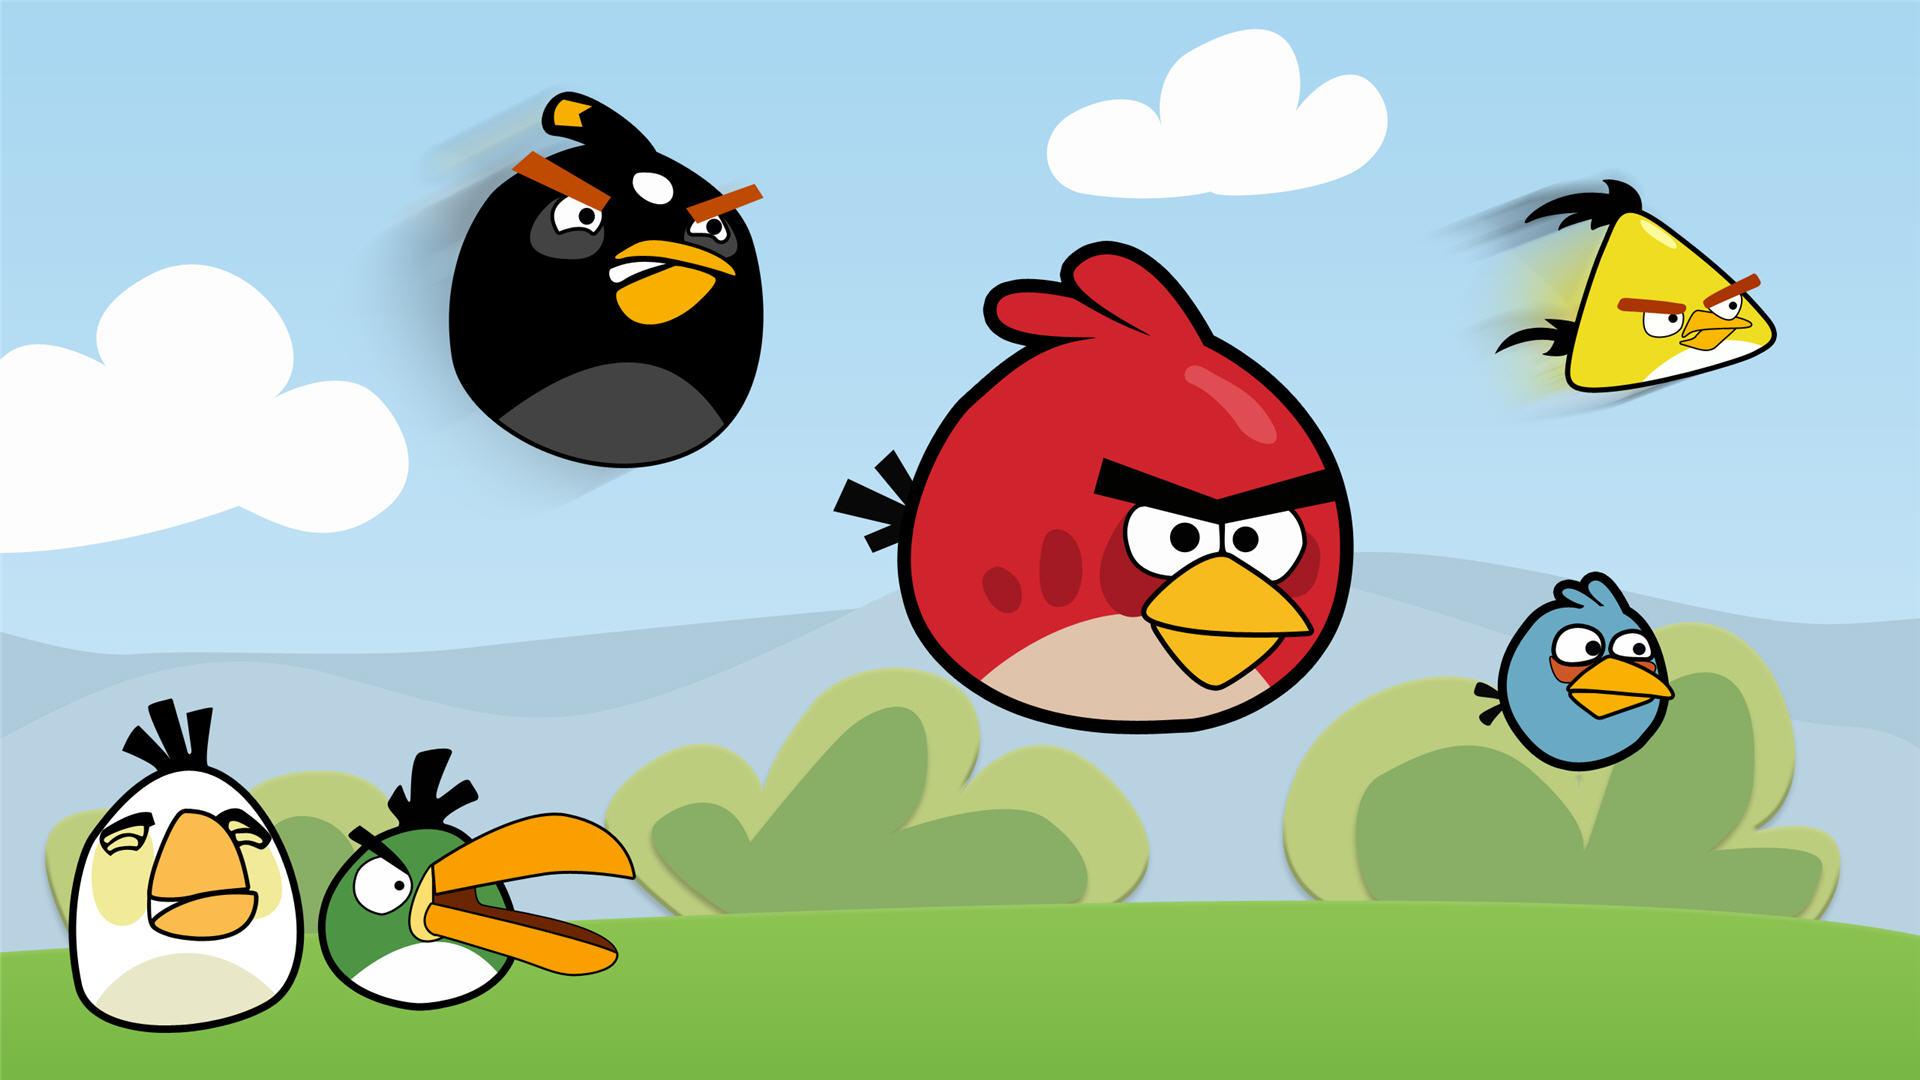 Hd Bird Live Wallpaper Background Angry Birds Hd 1920x1080 Wallpaper Teahub Io